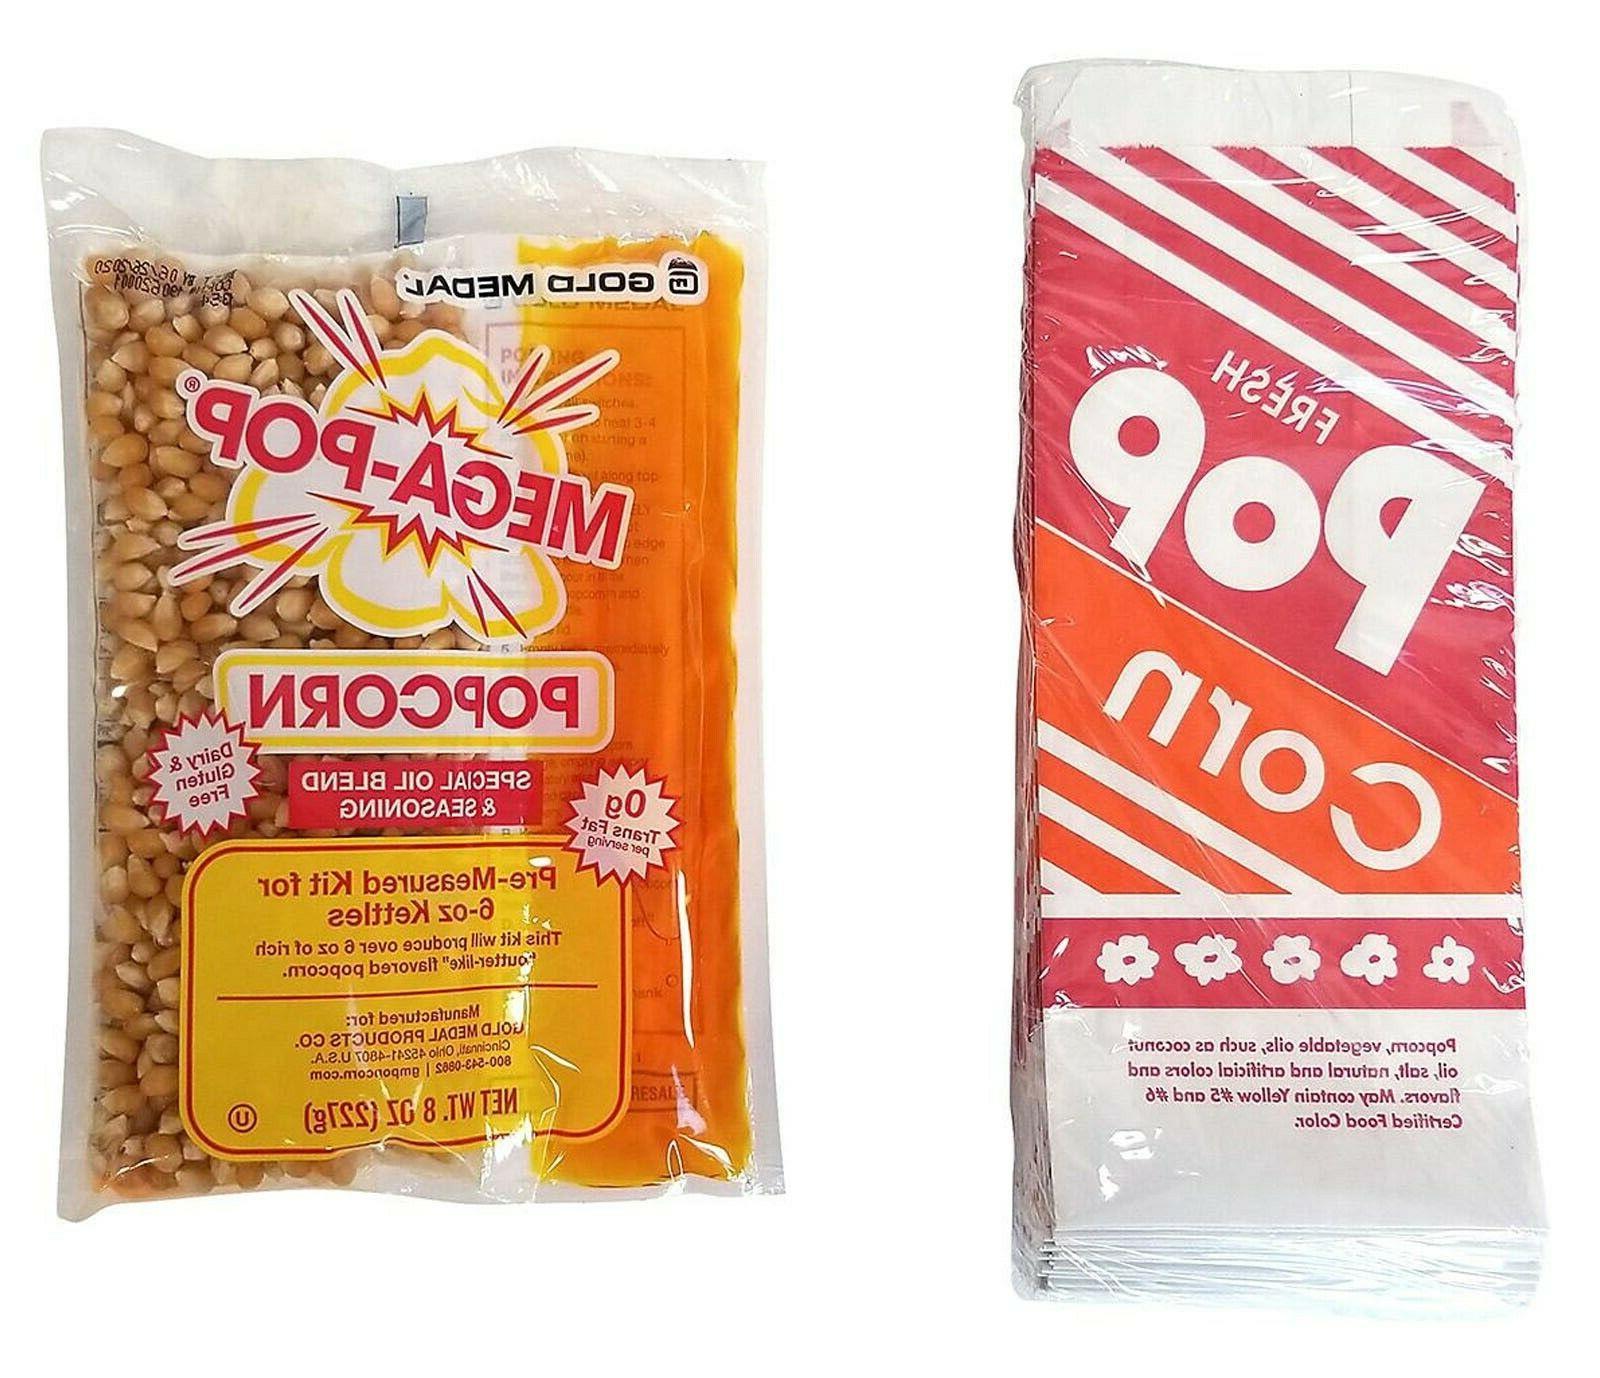 Gold Medal 36 8oz Popcorn Kit with 216 1 oz Bags for 6 oz Po